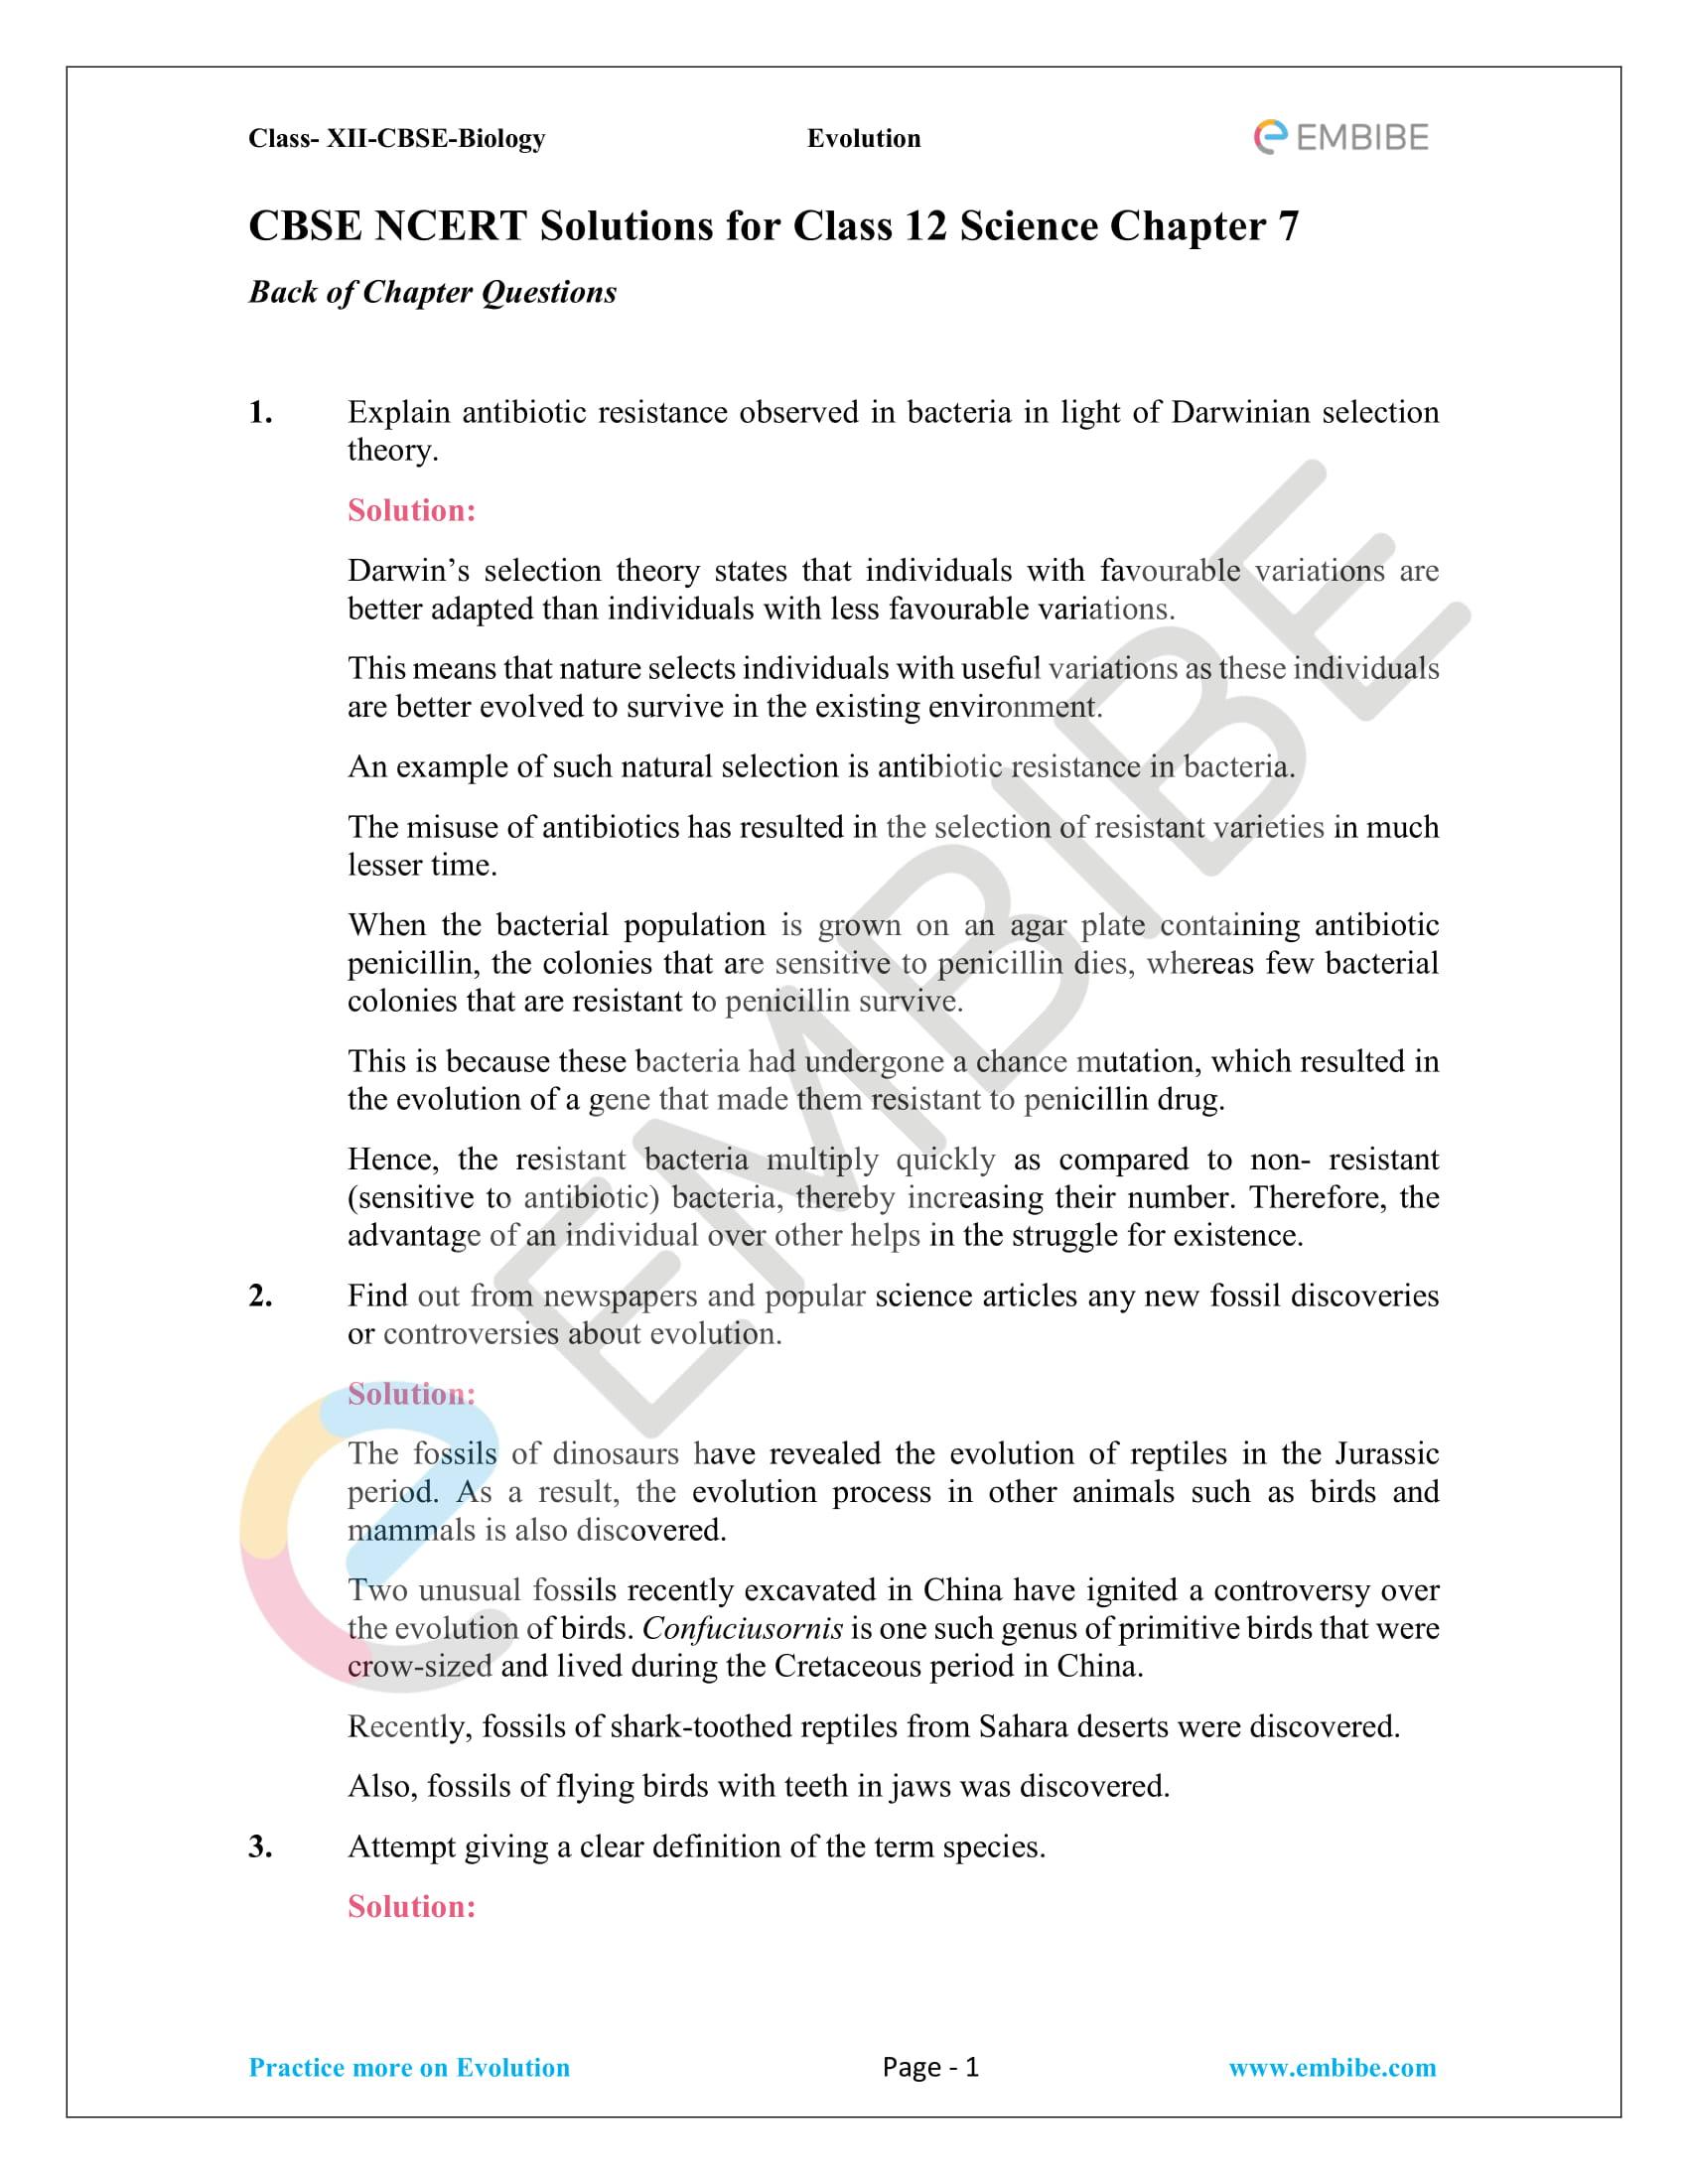 NCERT Solutions for Class 12 Biology Chapter 7 - Evolution - 1